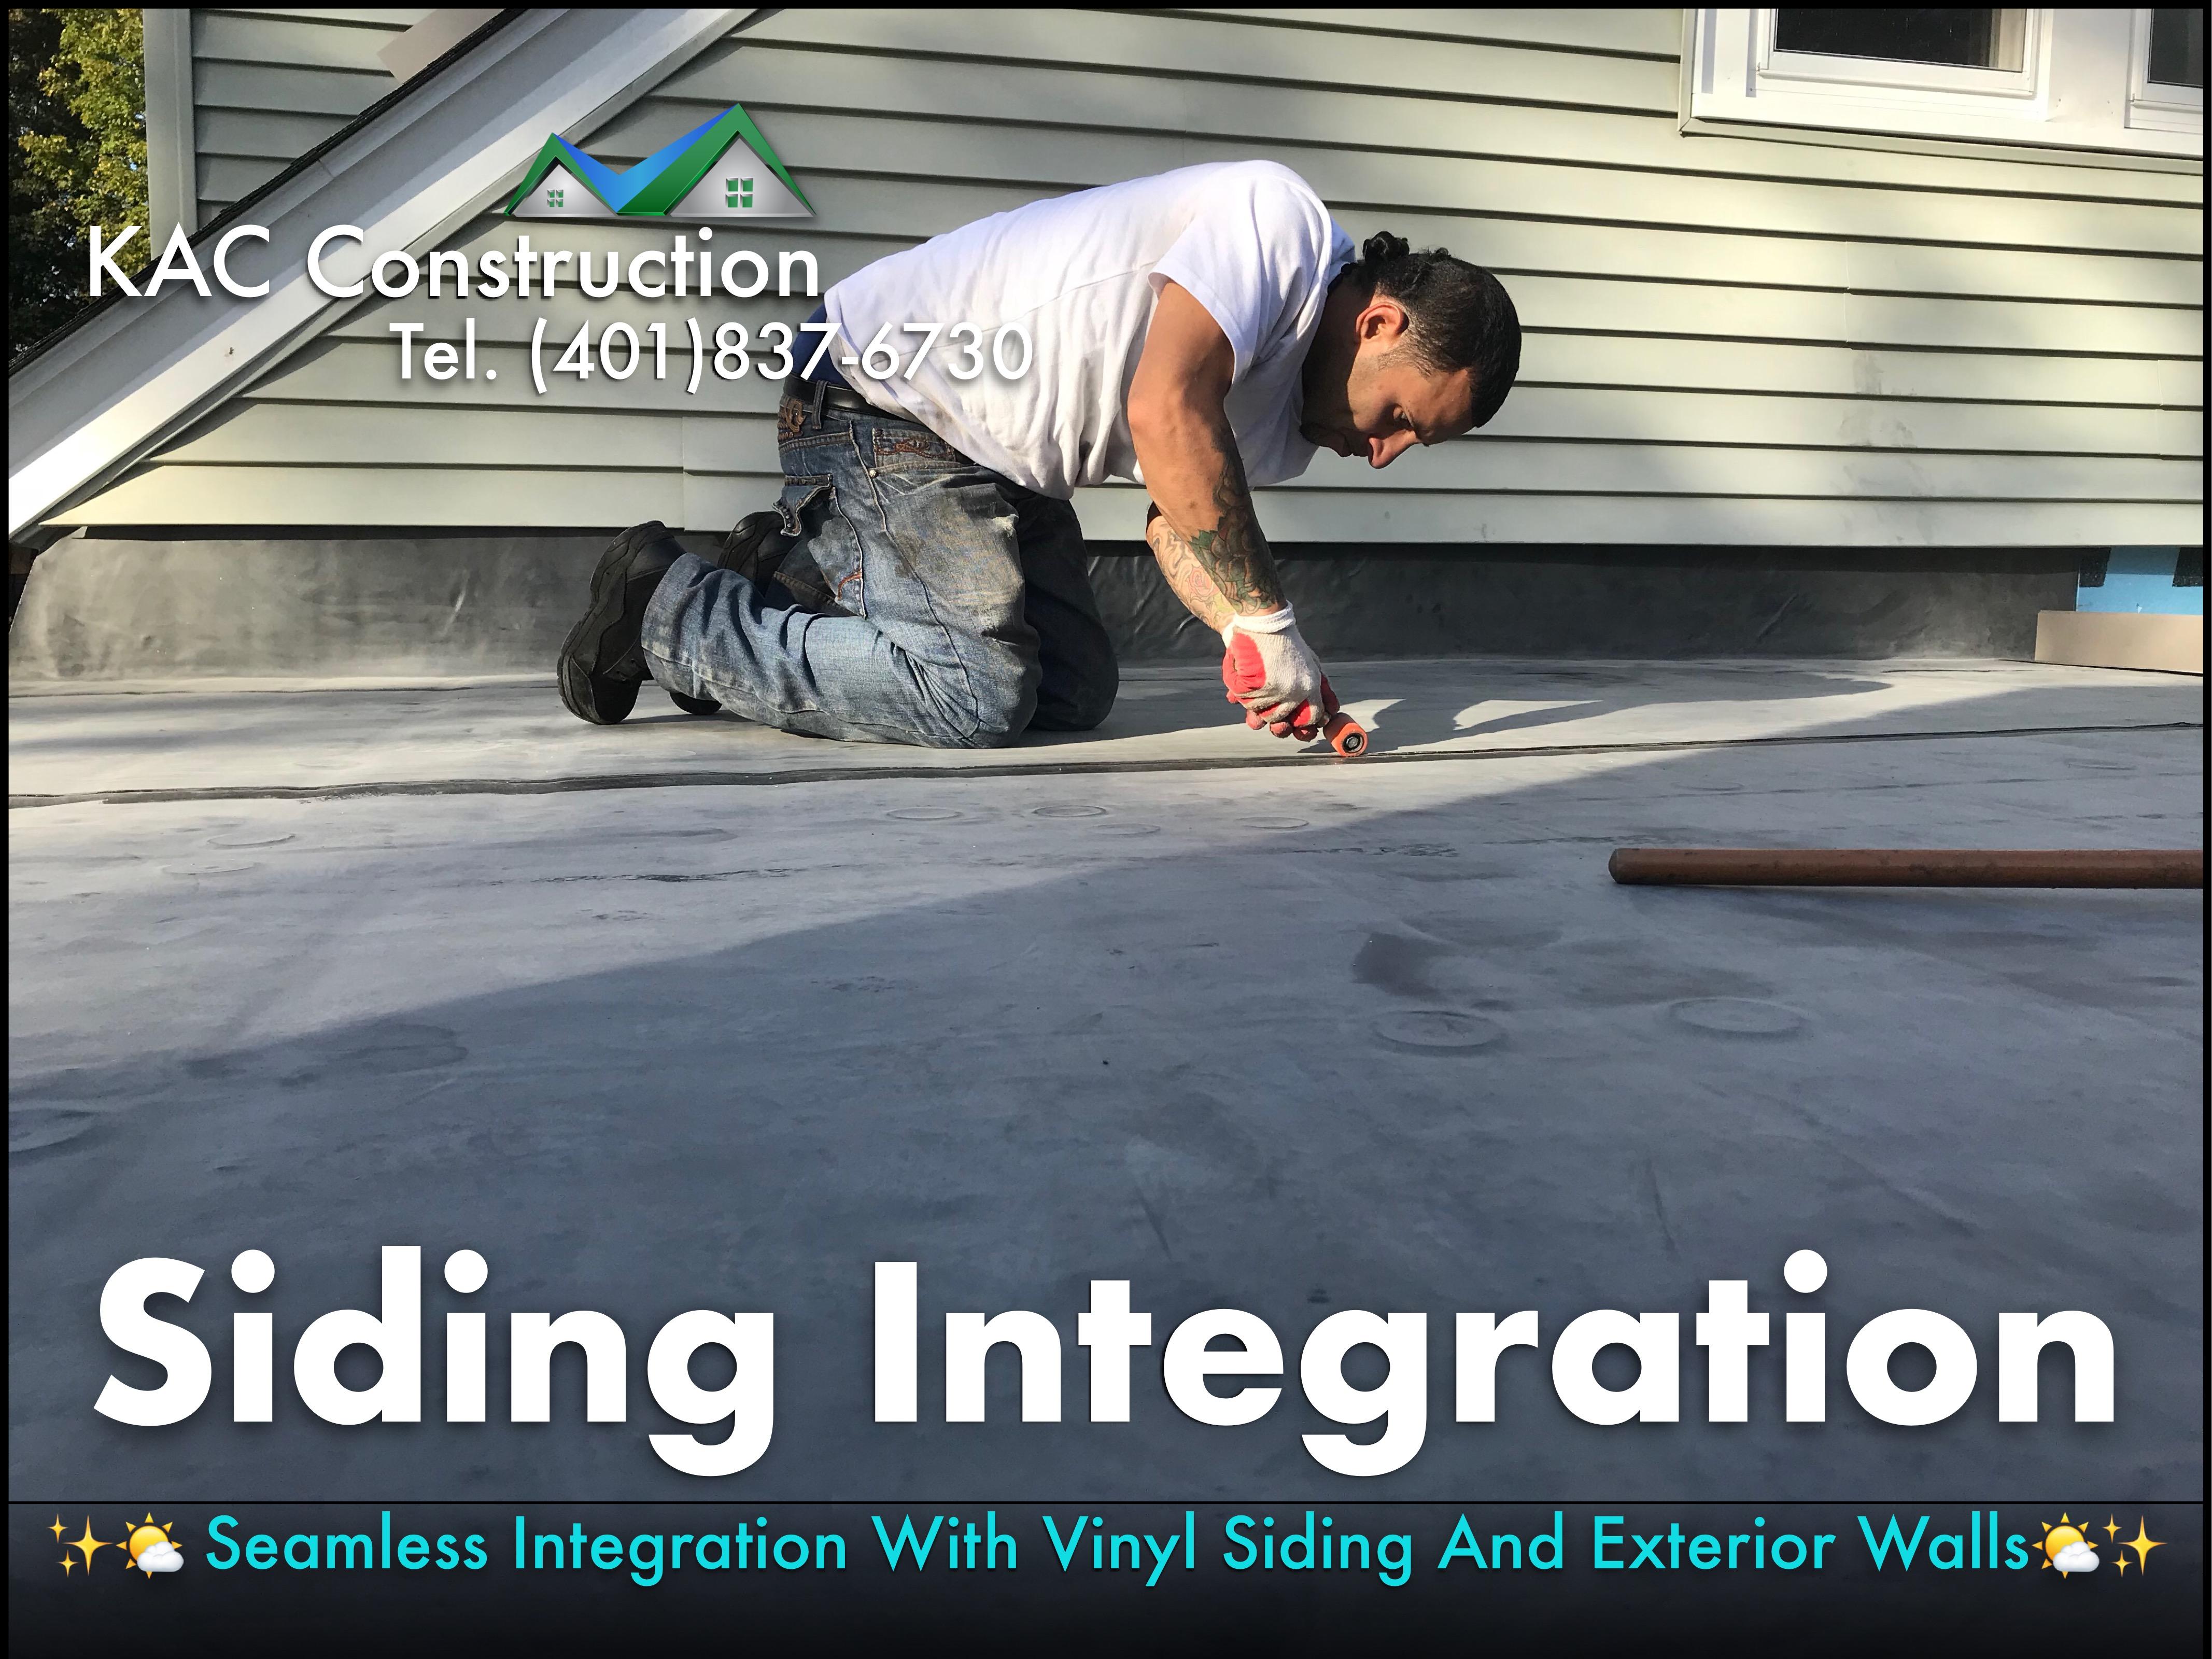 Rubber roof, rubber roof providence, rubber roof providence ri, rubber roof contractor providence, rubber roof contractor providence ri